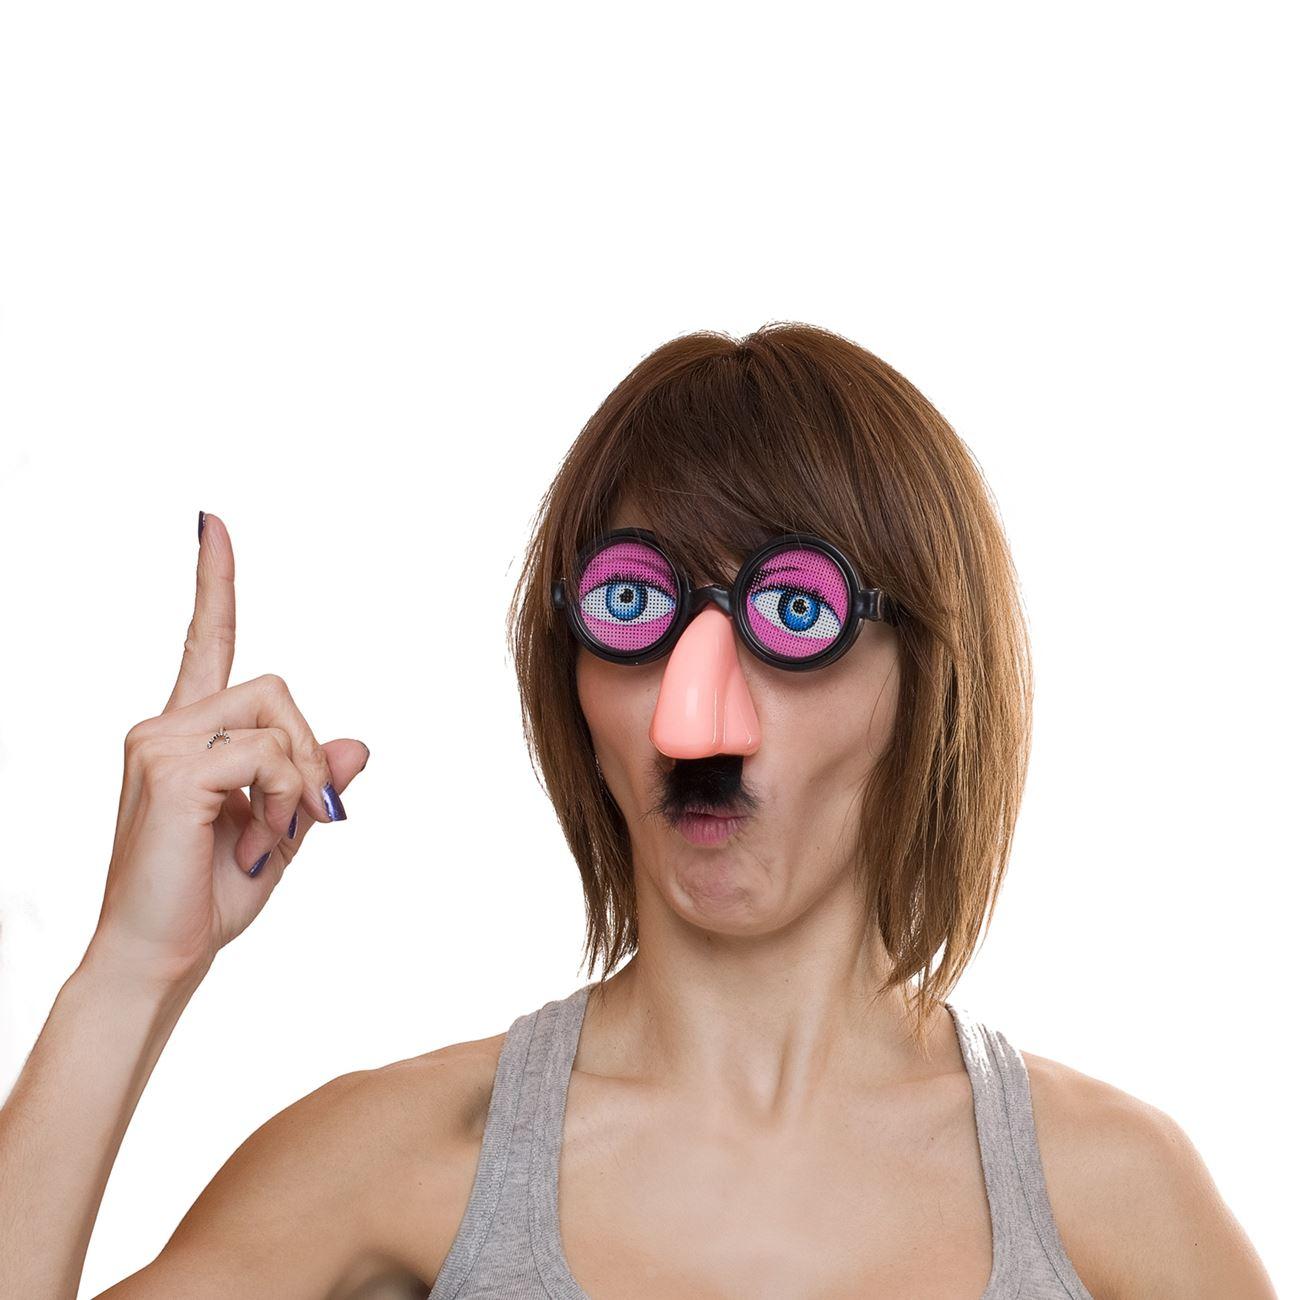 2082e4541510 Γυαλιά με Μάτια - Μύτη με Τρίχες   Αποκριάτικα Γυαλιά Χαρακτήρων